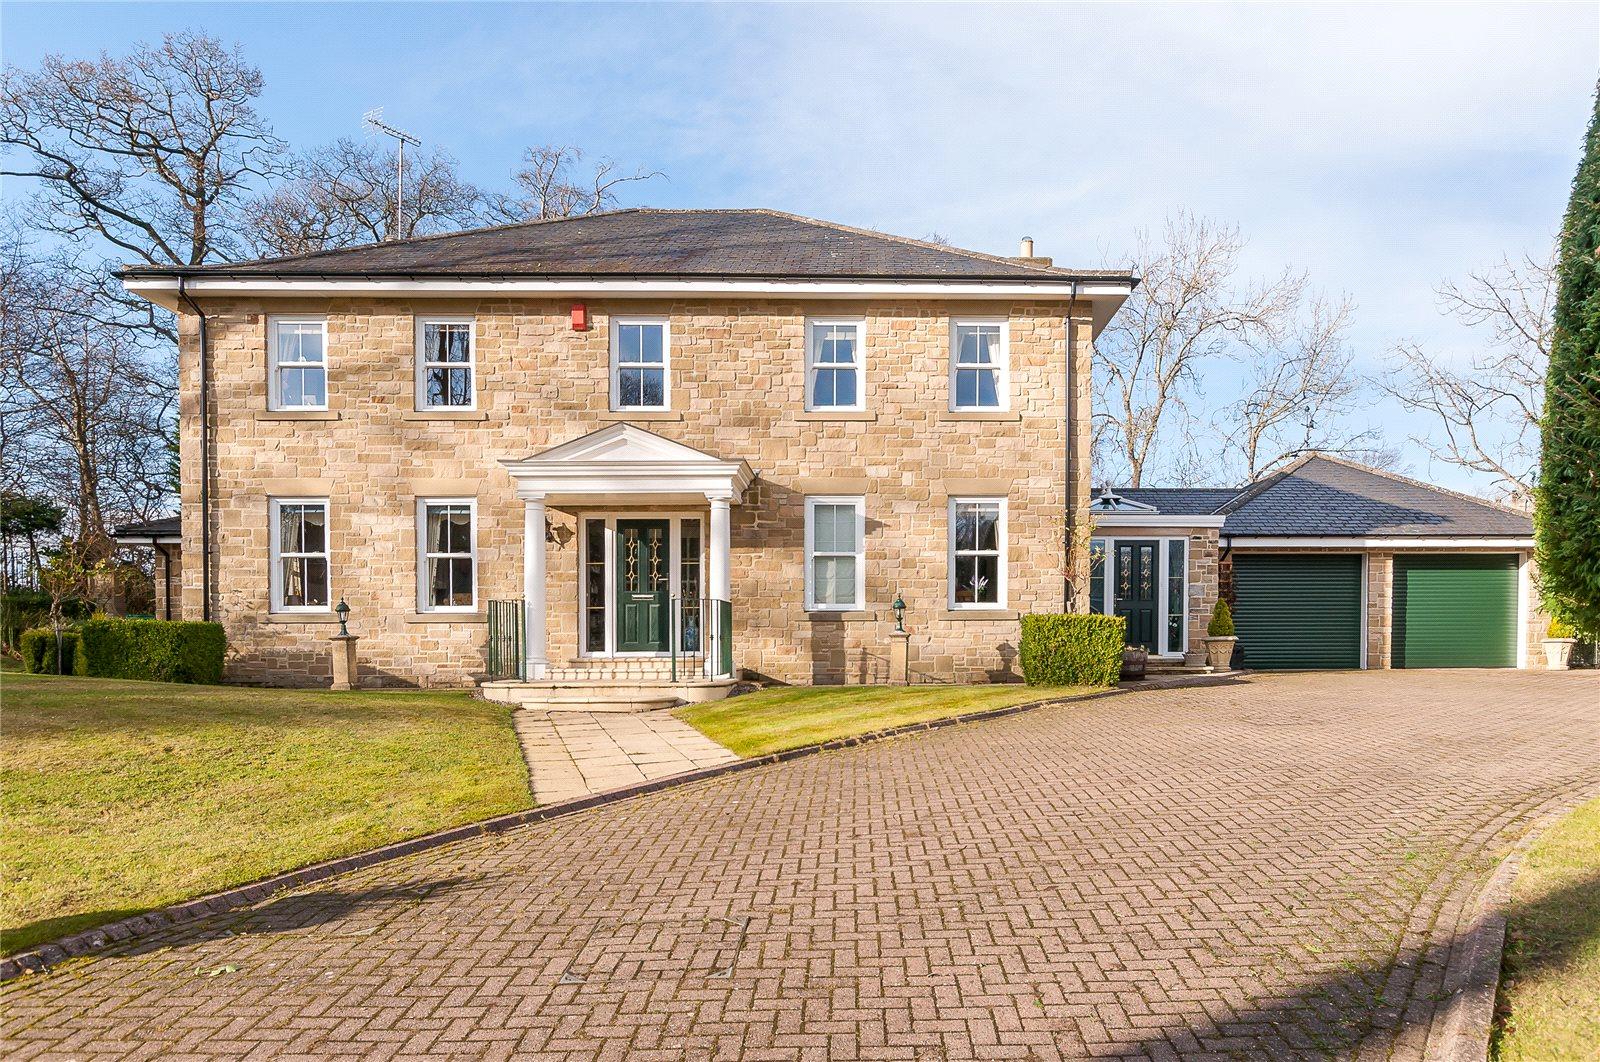 Single Family Home for Sale at Linden Acres, Longhorsley, Morpeth, Northumberland, NE65 Morpeth, England